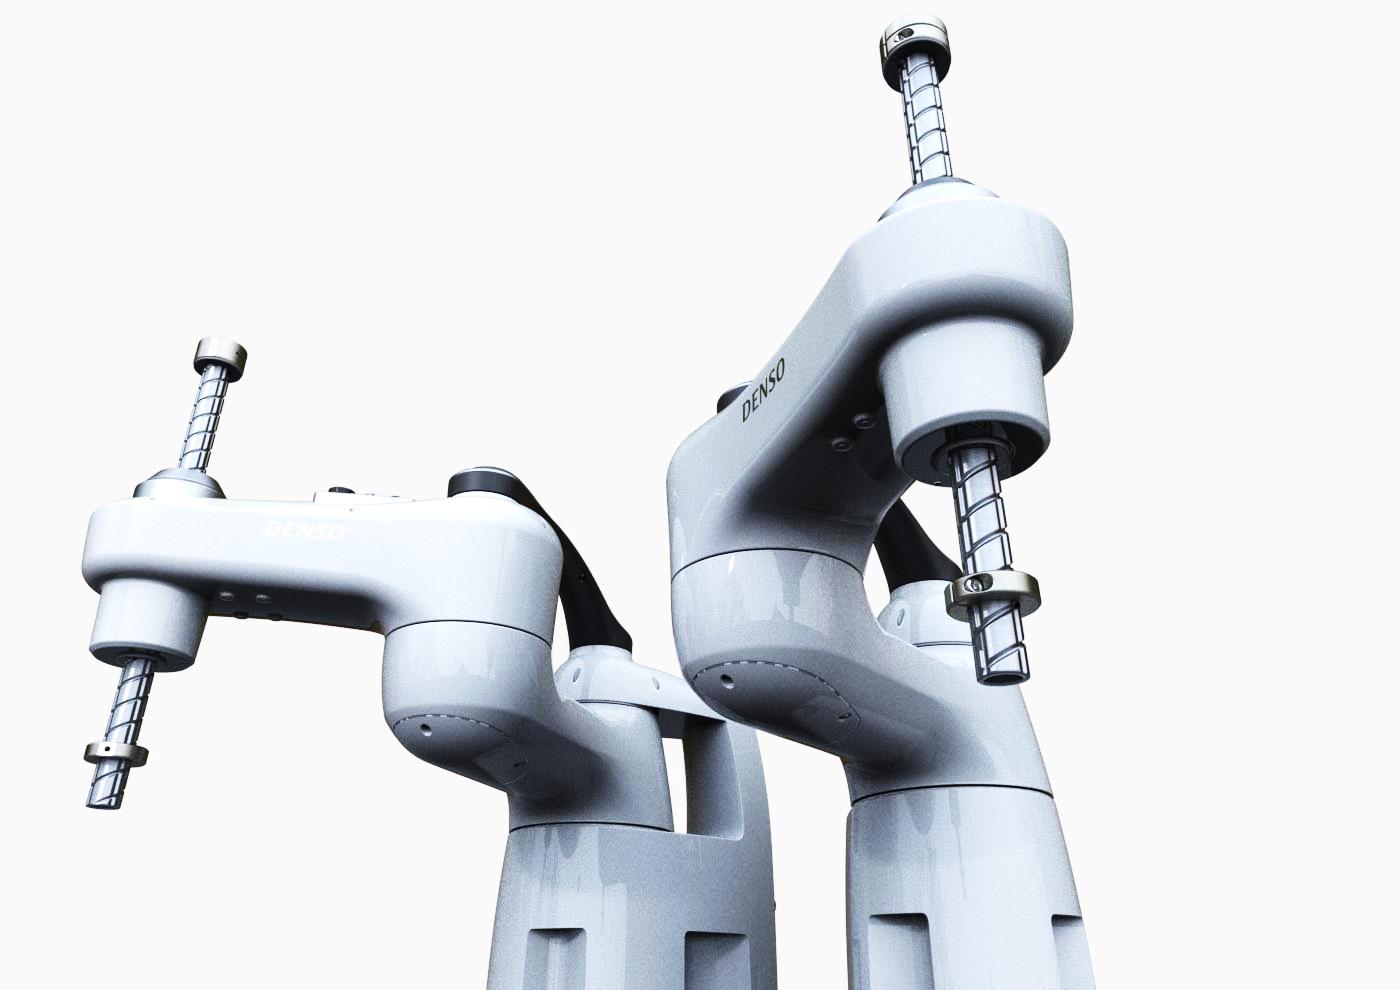 robot industriali Denso KLAIN robotics